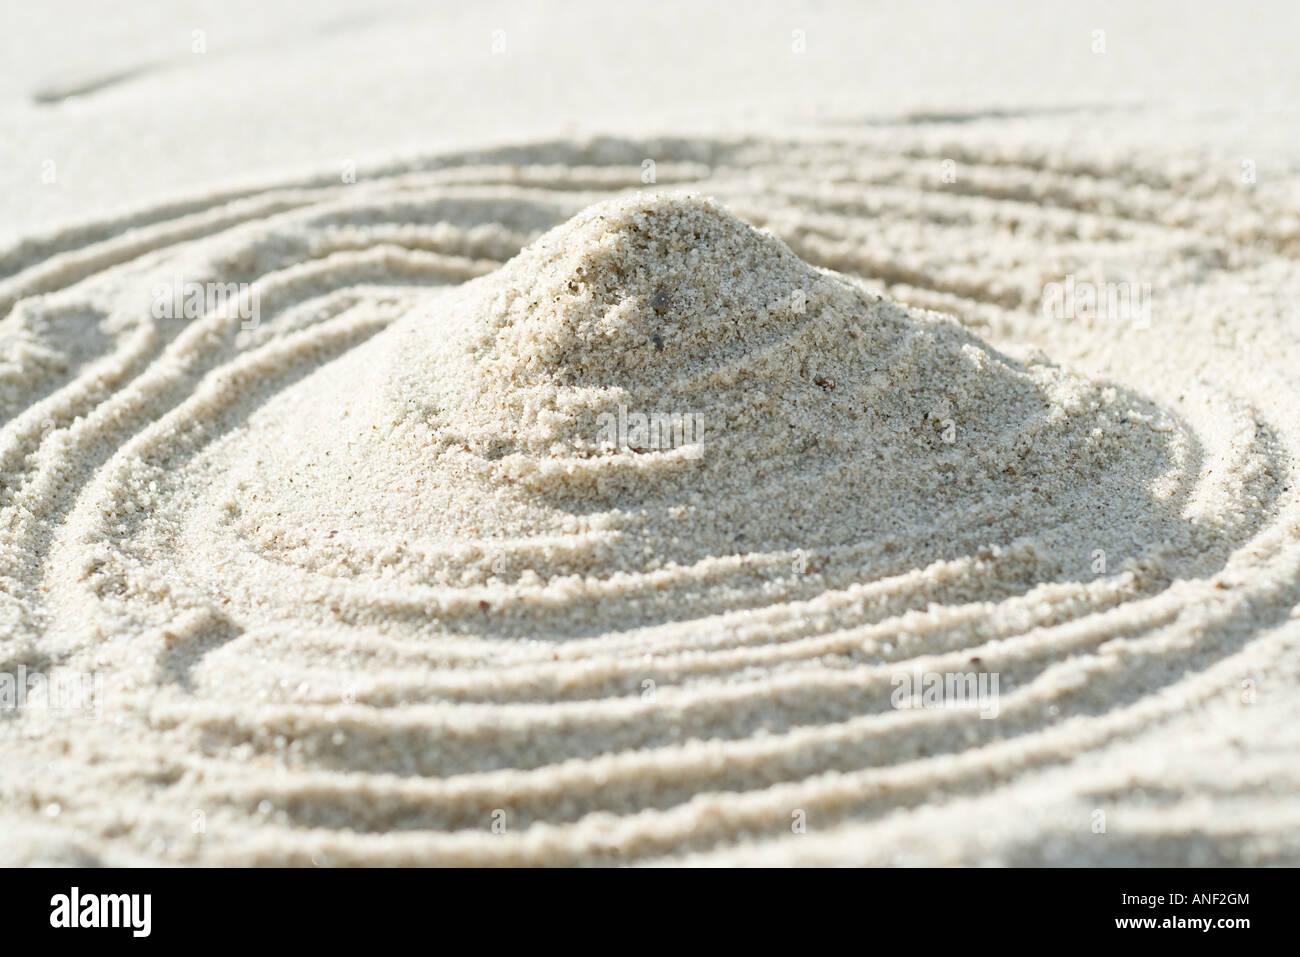 Mound of sand - Stock Image